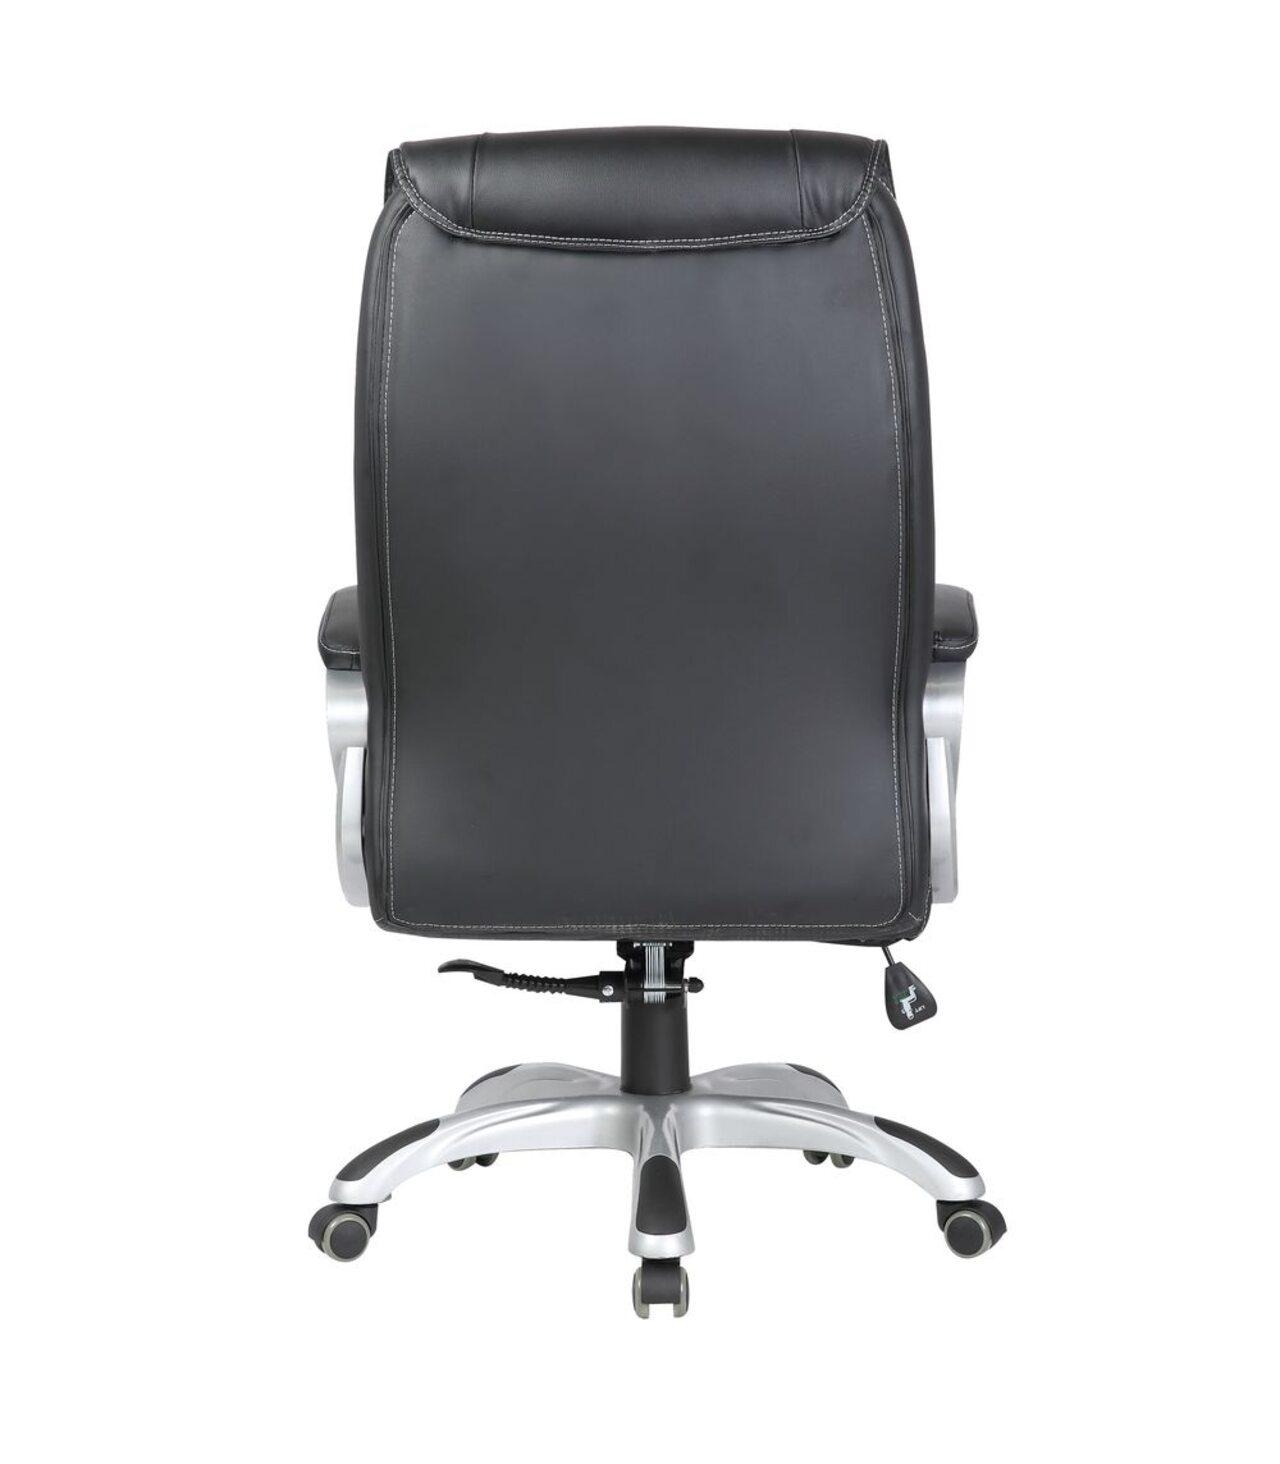 Кресло руководителя College CLG-615 LXH - фото 5